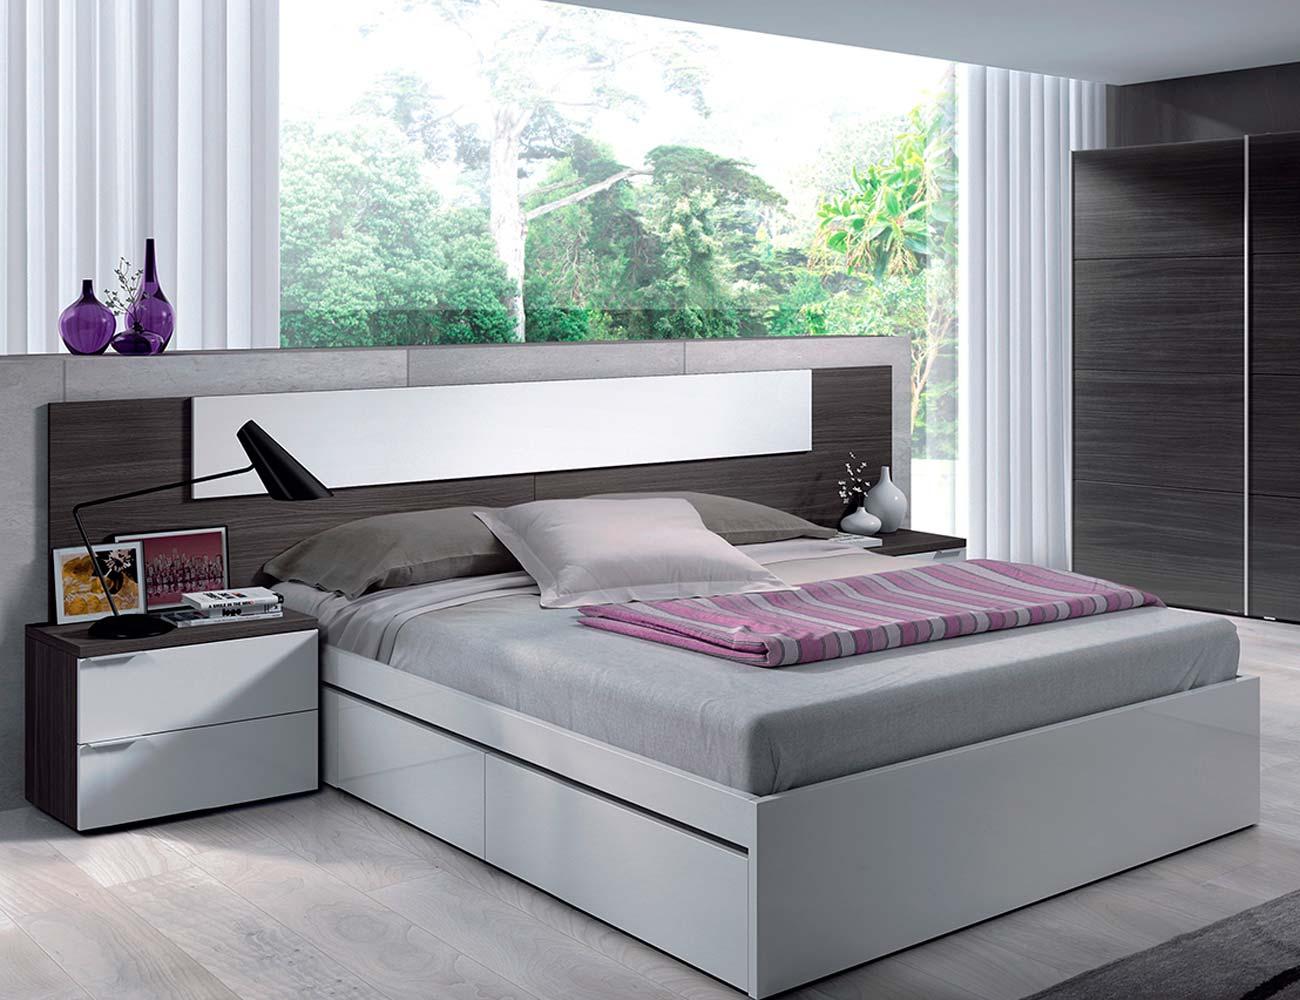 Dormitorio matrimonio moderno barato gris ceniza blanco